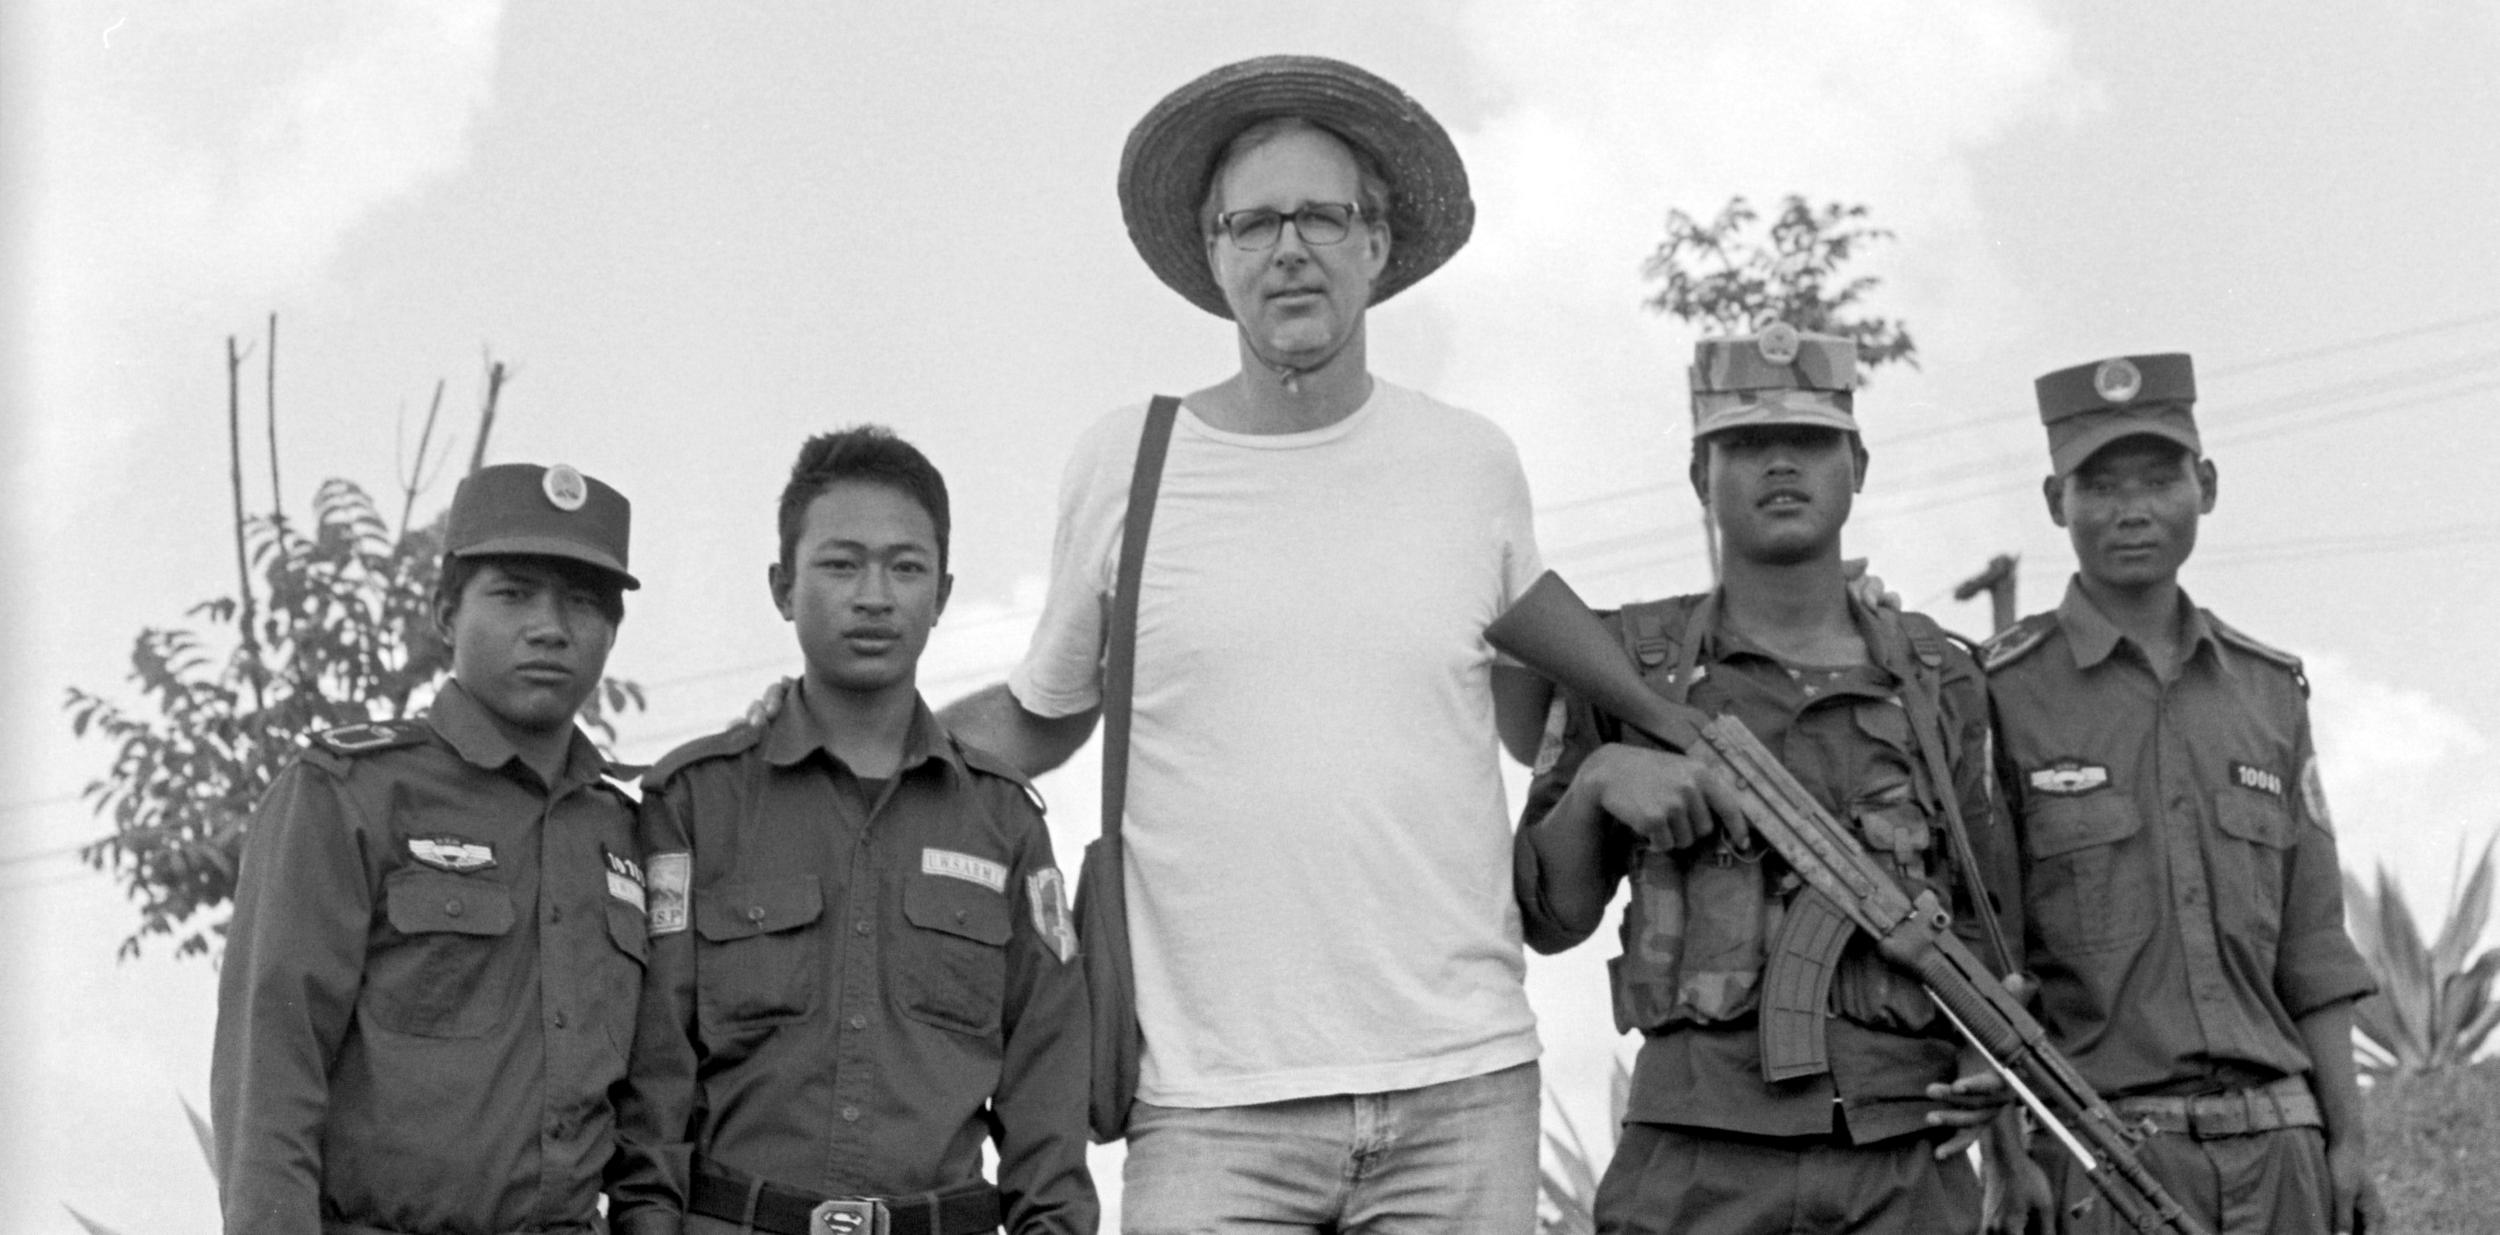 Scott Ezell with Wa State Army soldiers, China-Burma border, 2014.